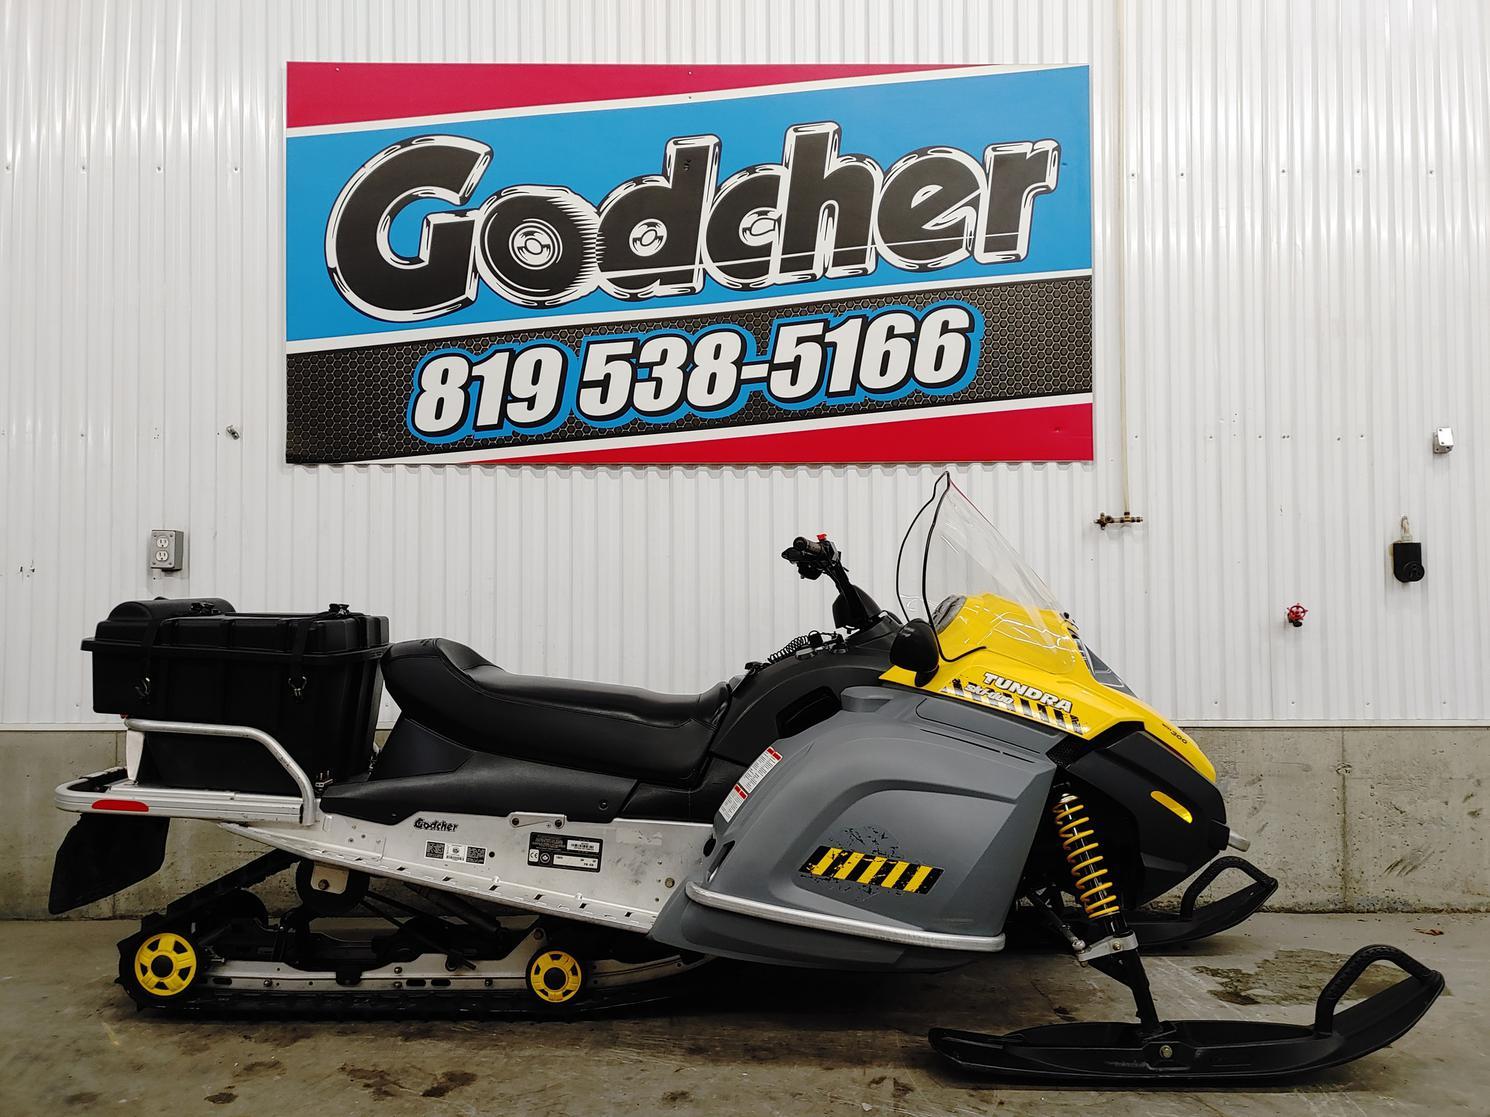 2007 Ski-Doo Tundra 300F